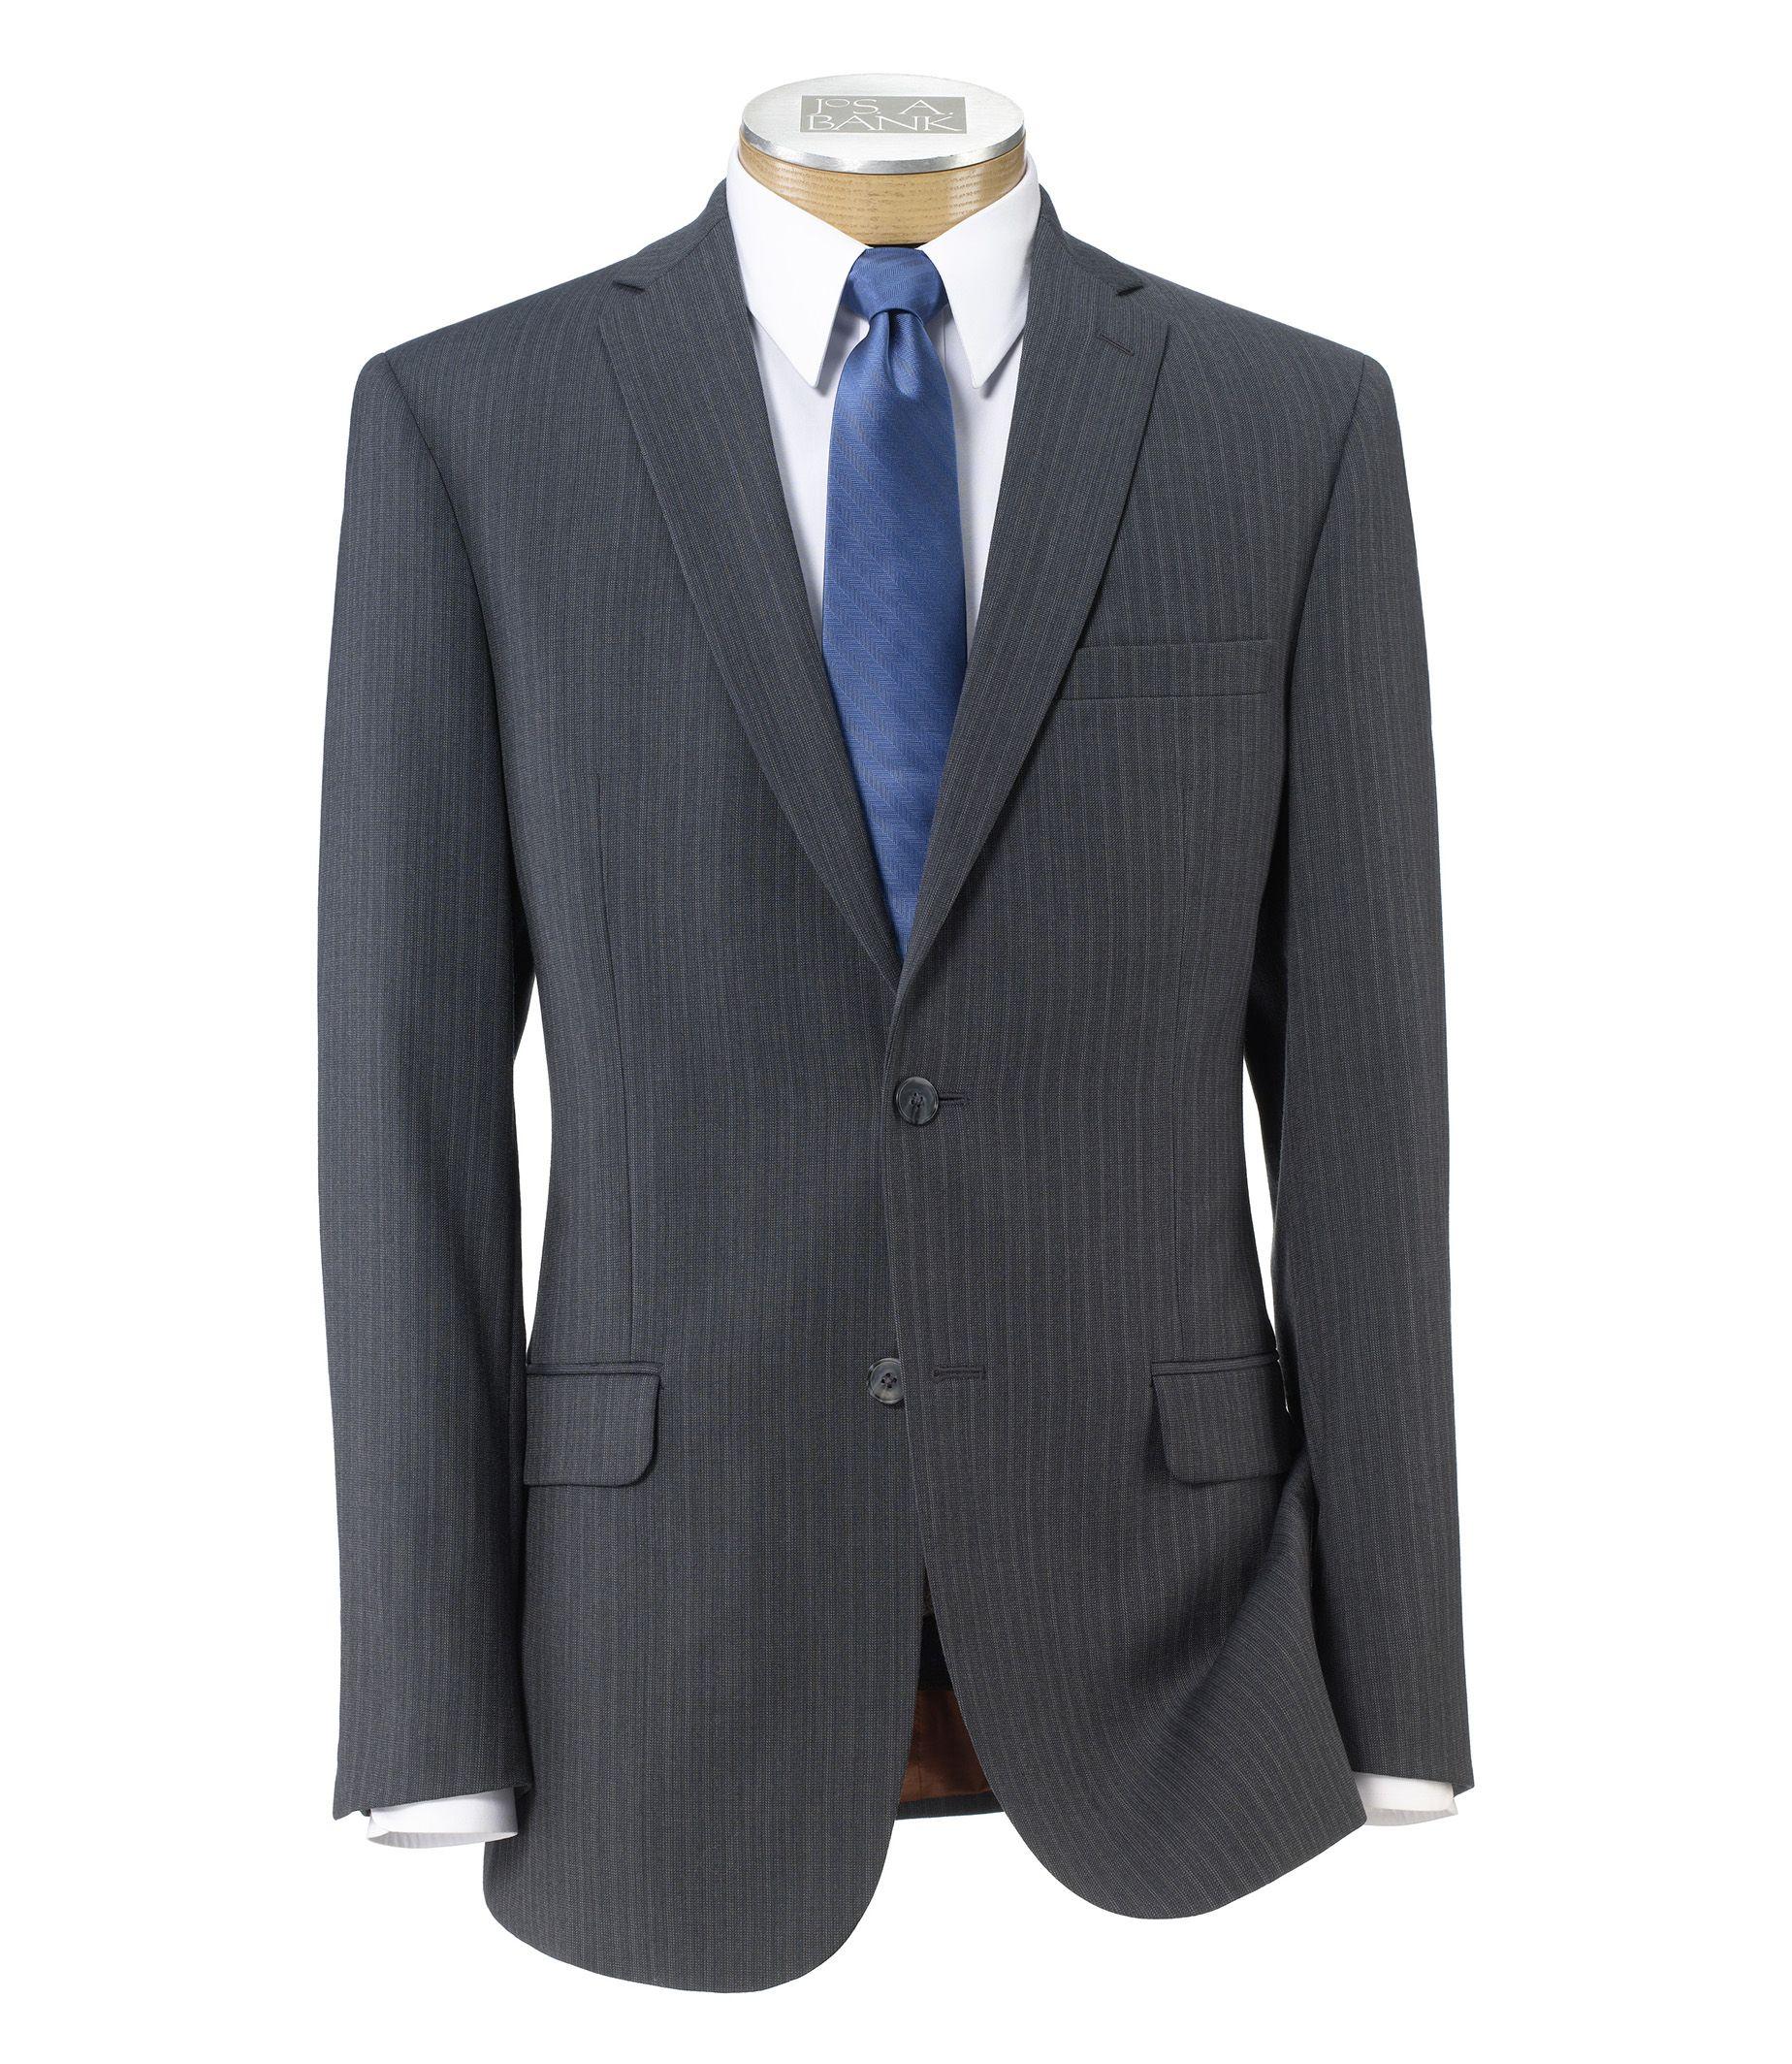 Joseph Slim Fit 2-Button Suits with Plain Front Trousers- Charcoal Dot Stripe